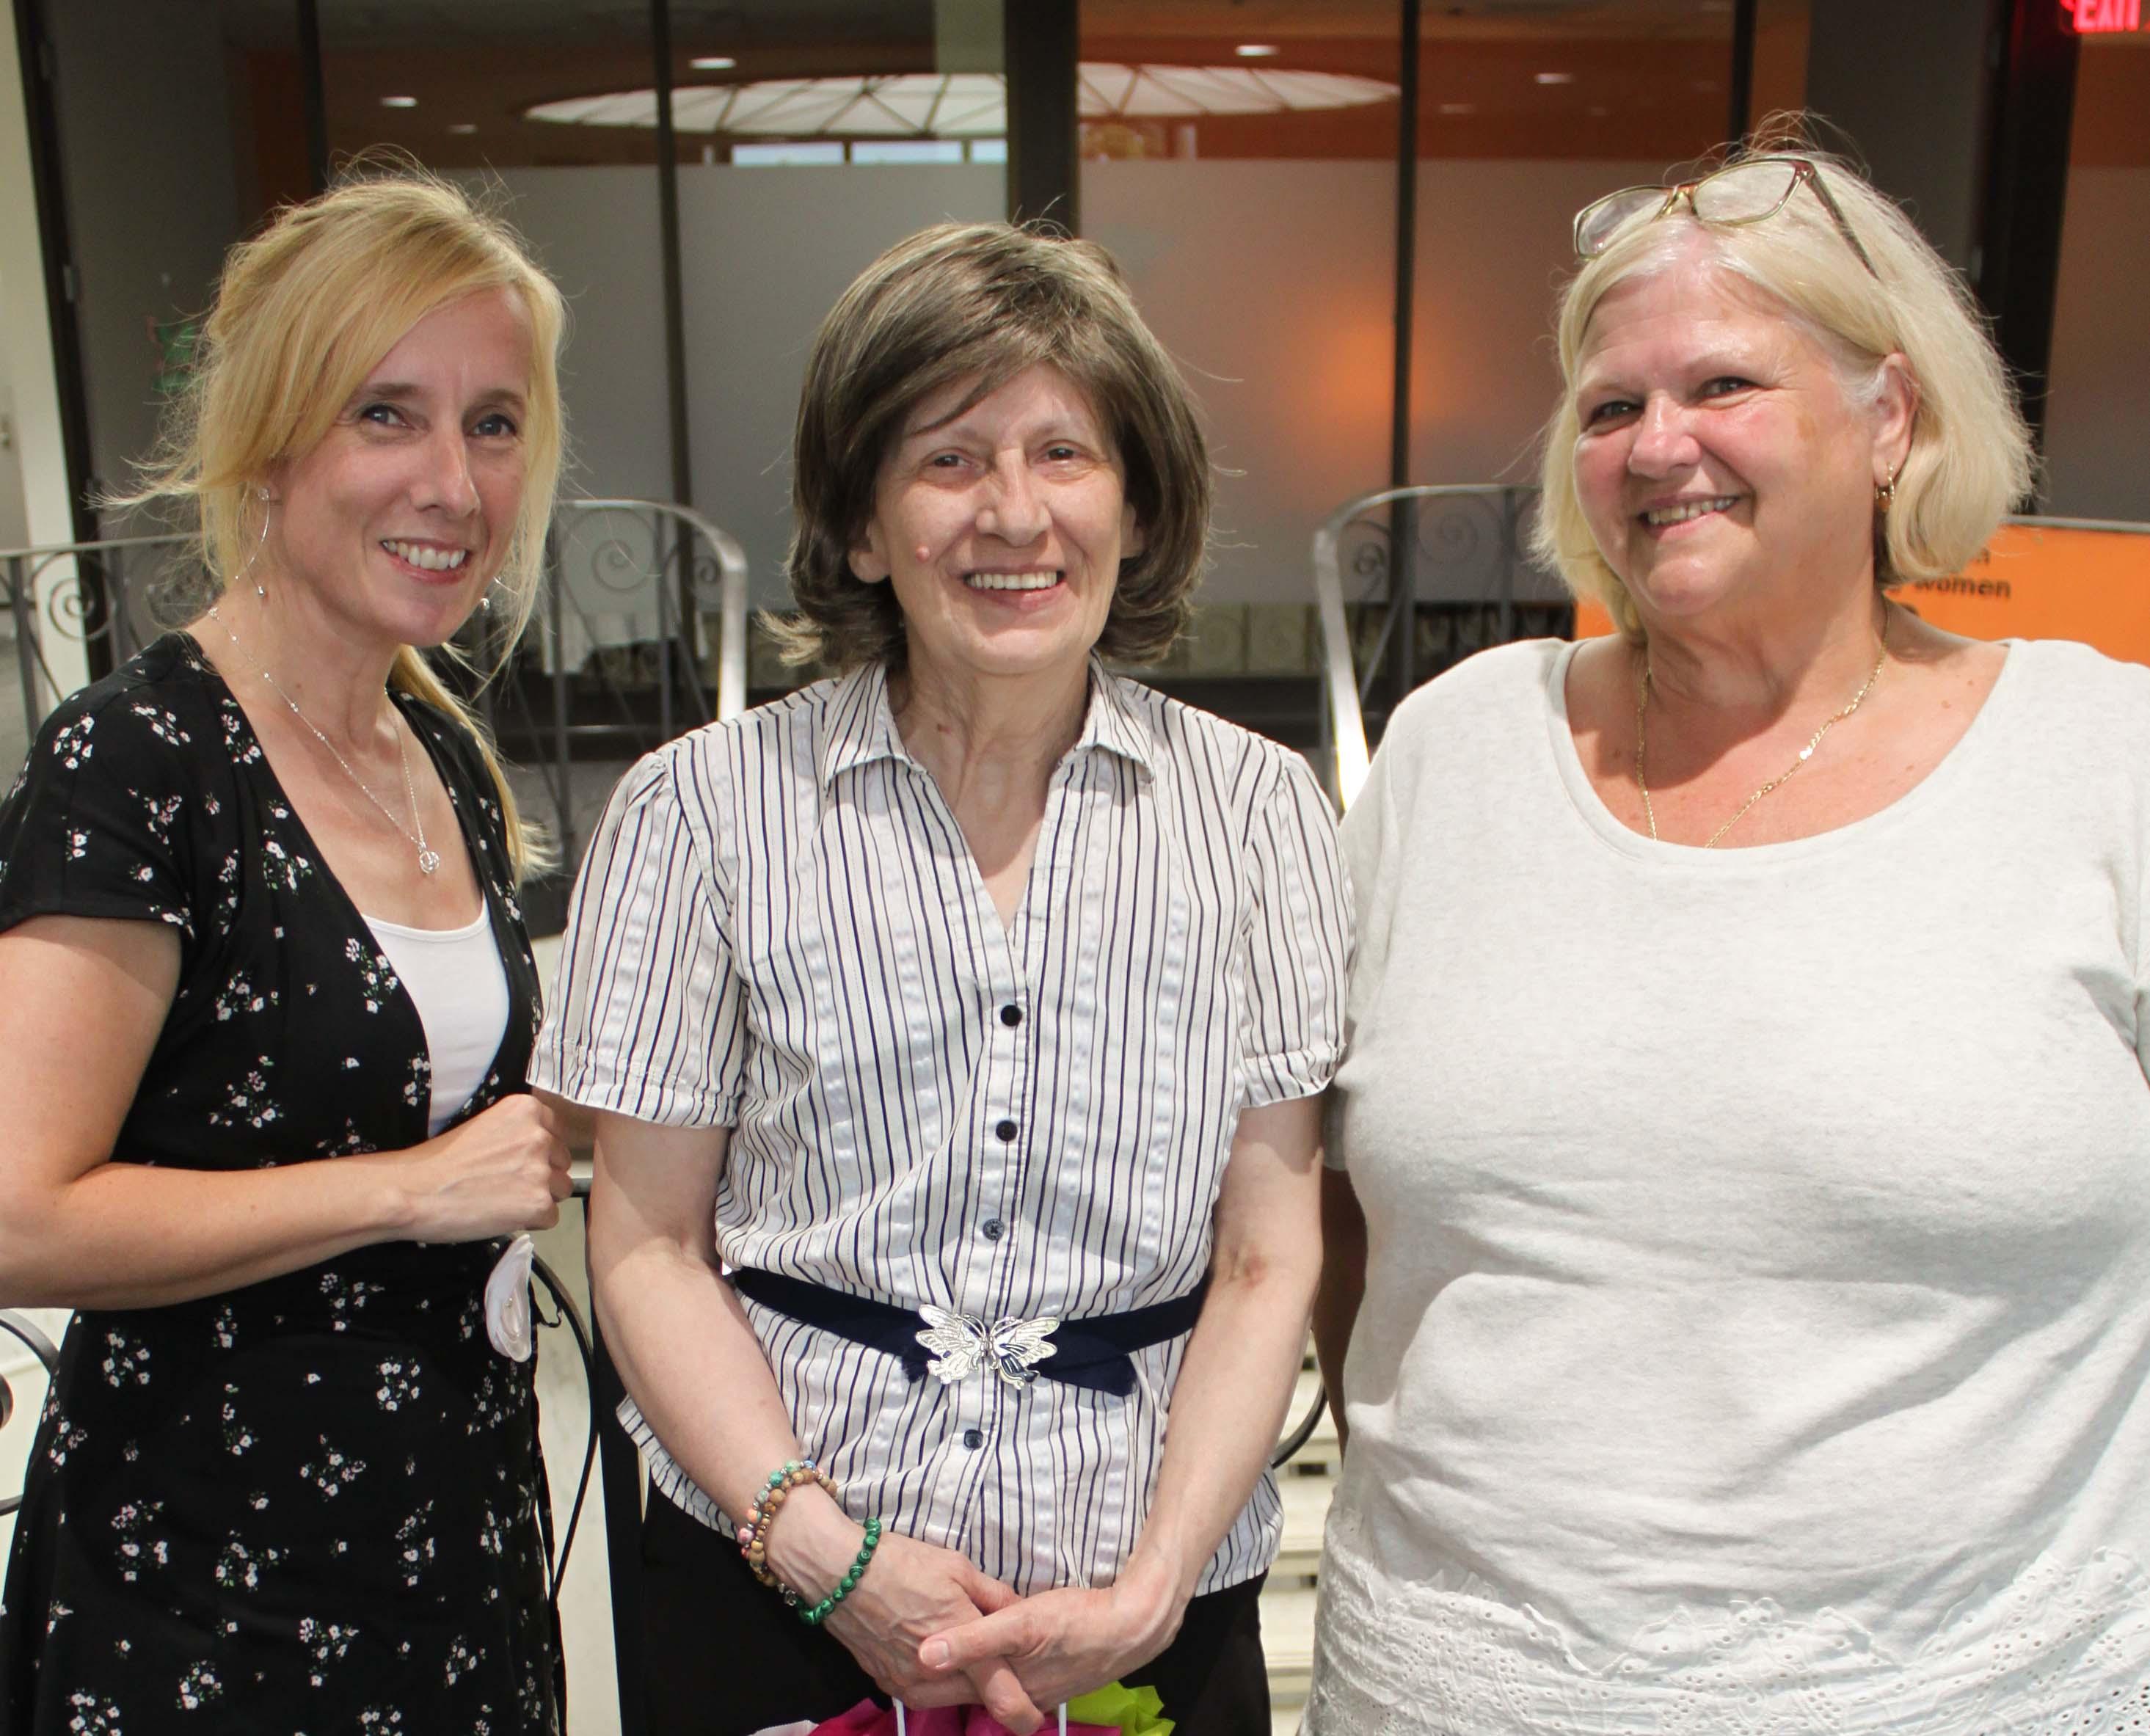 Laura, Gail, Melanie